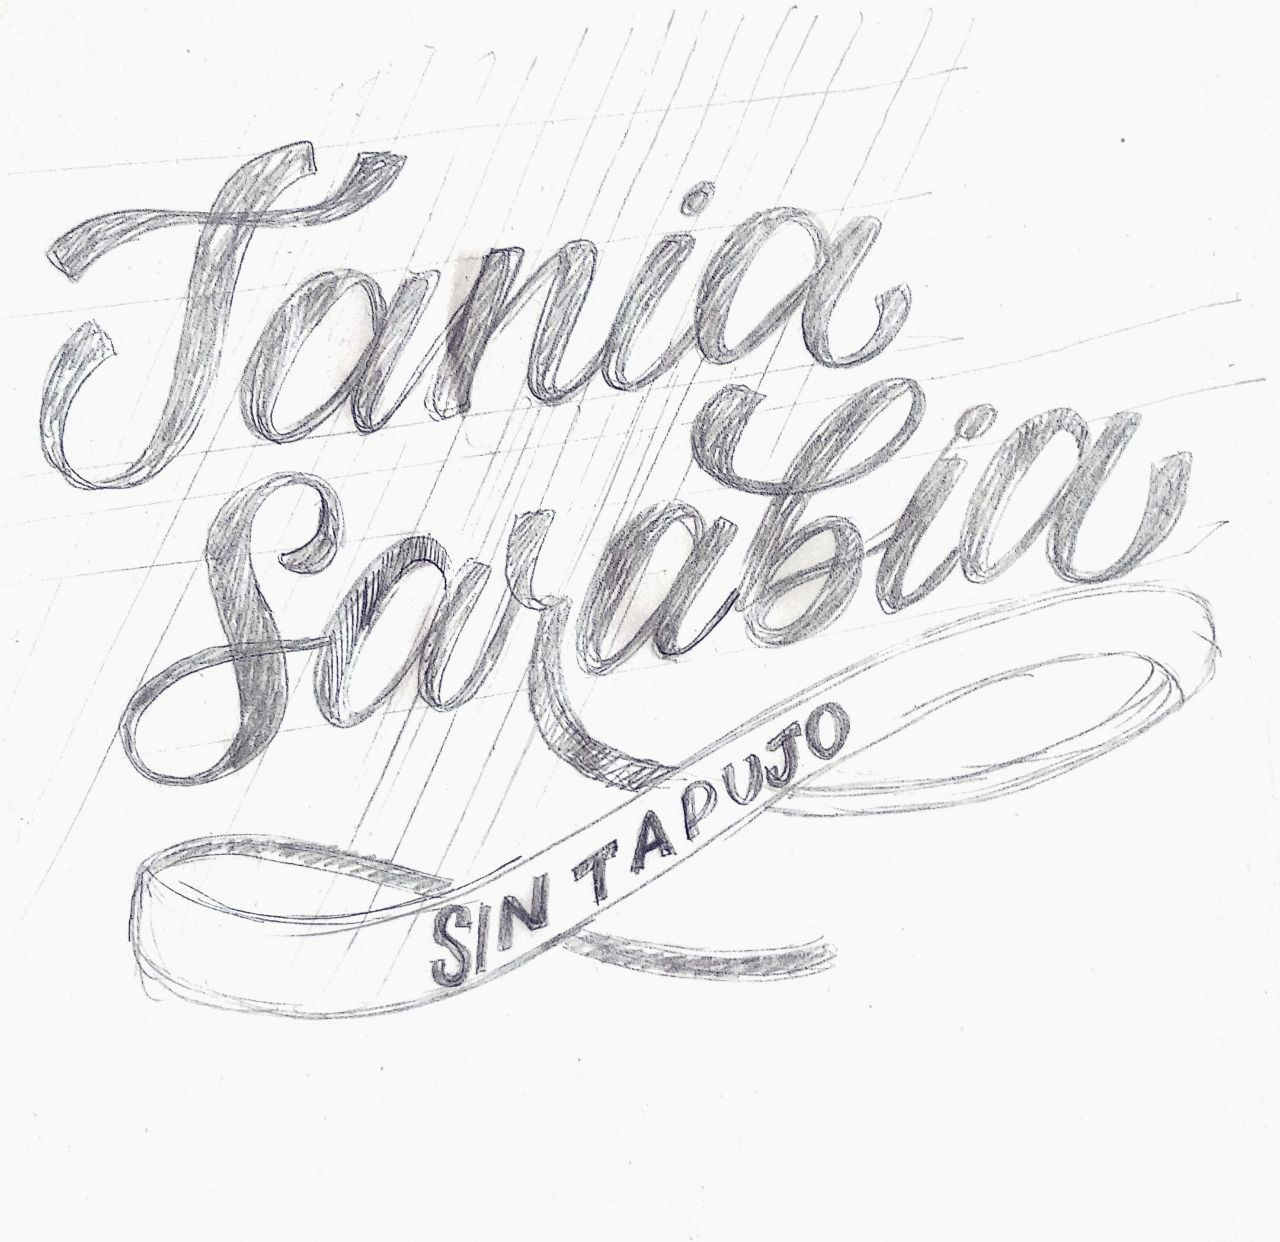 Tania Sarabia Sin Tapujo